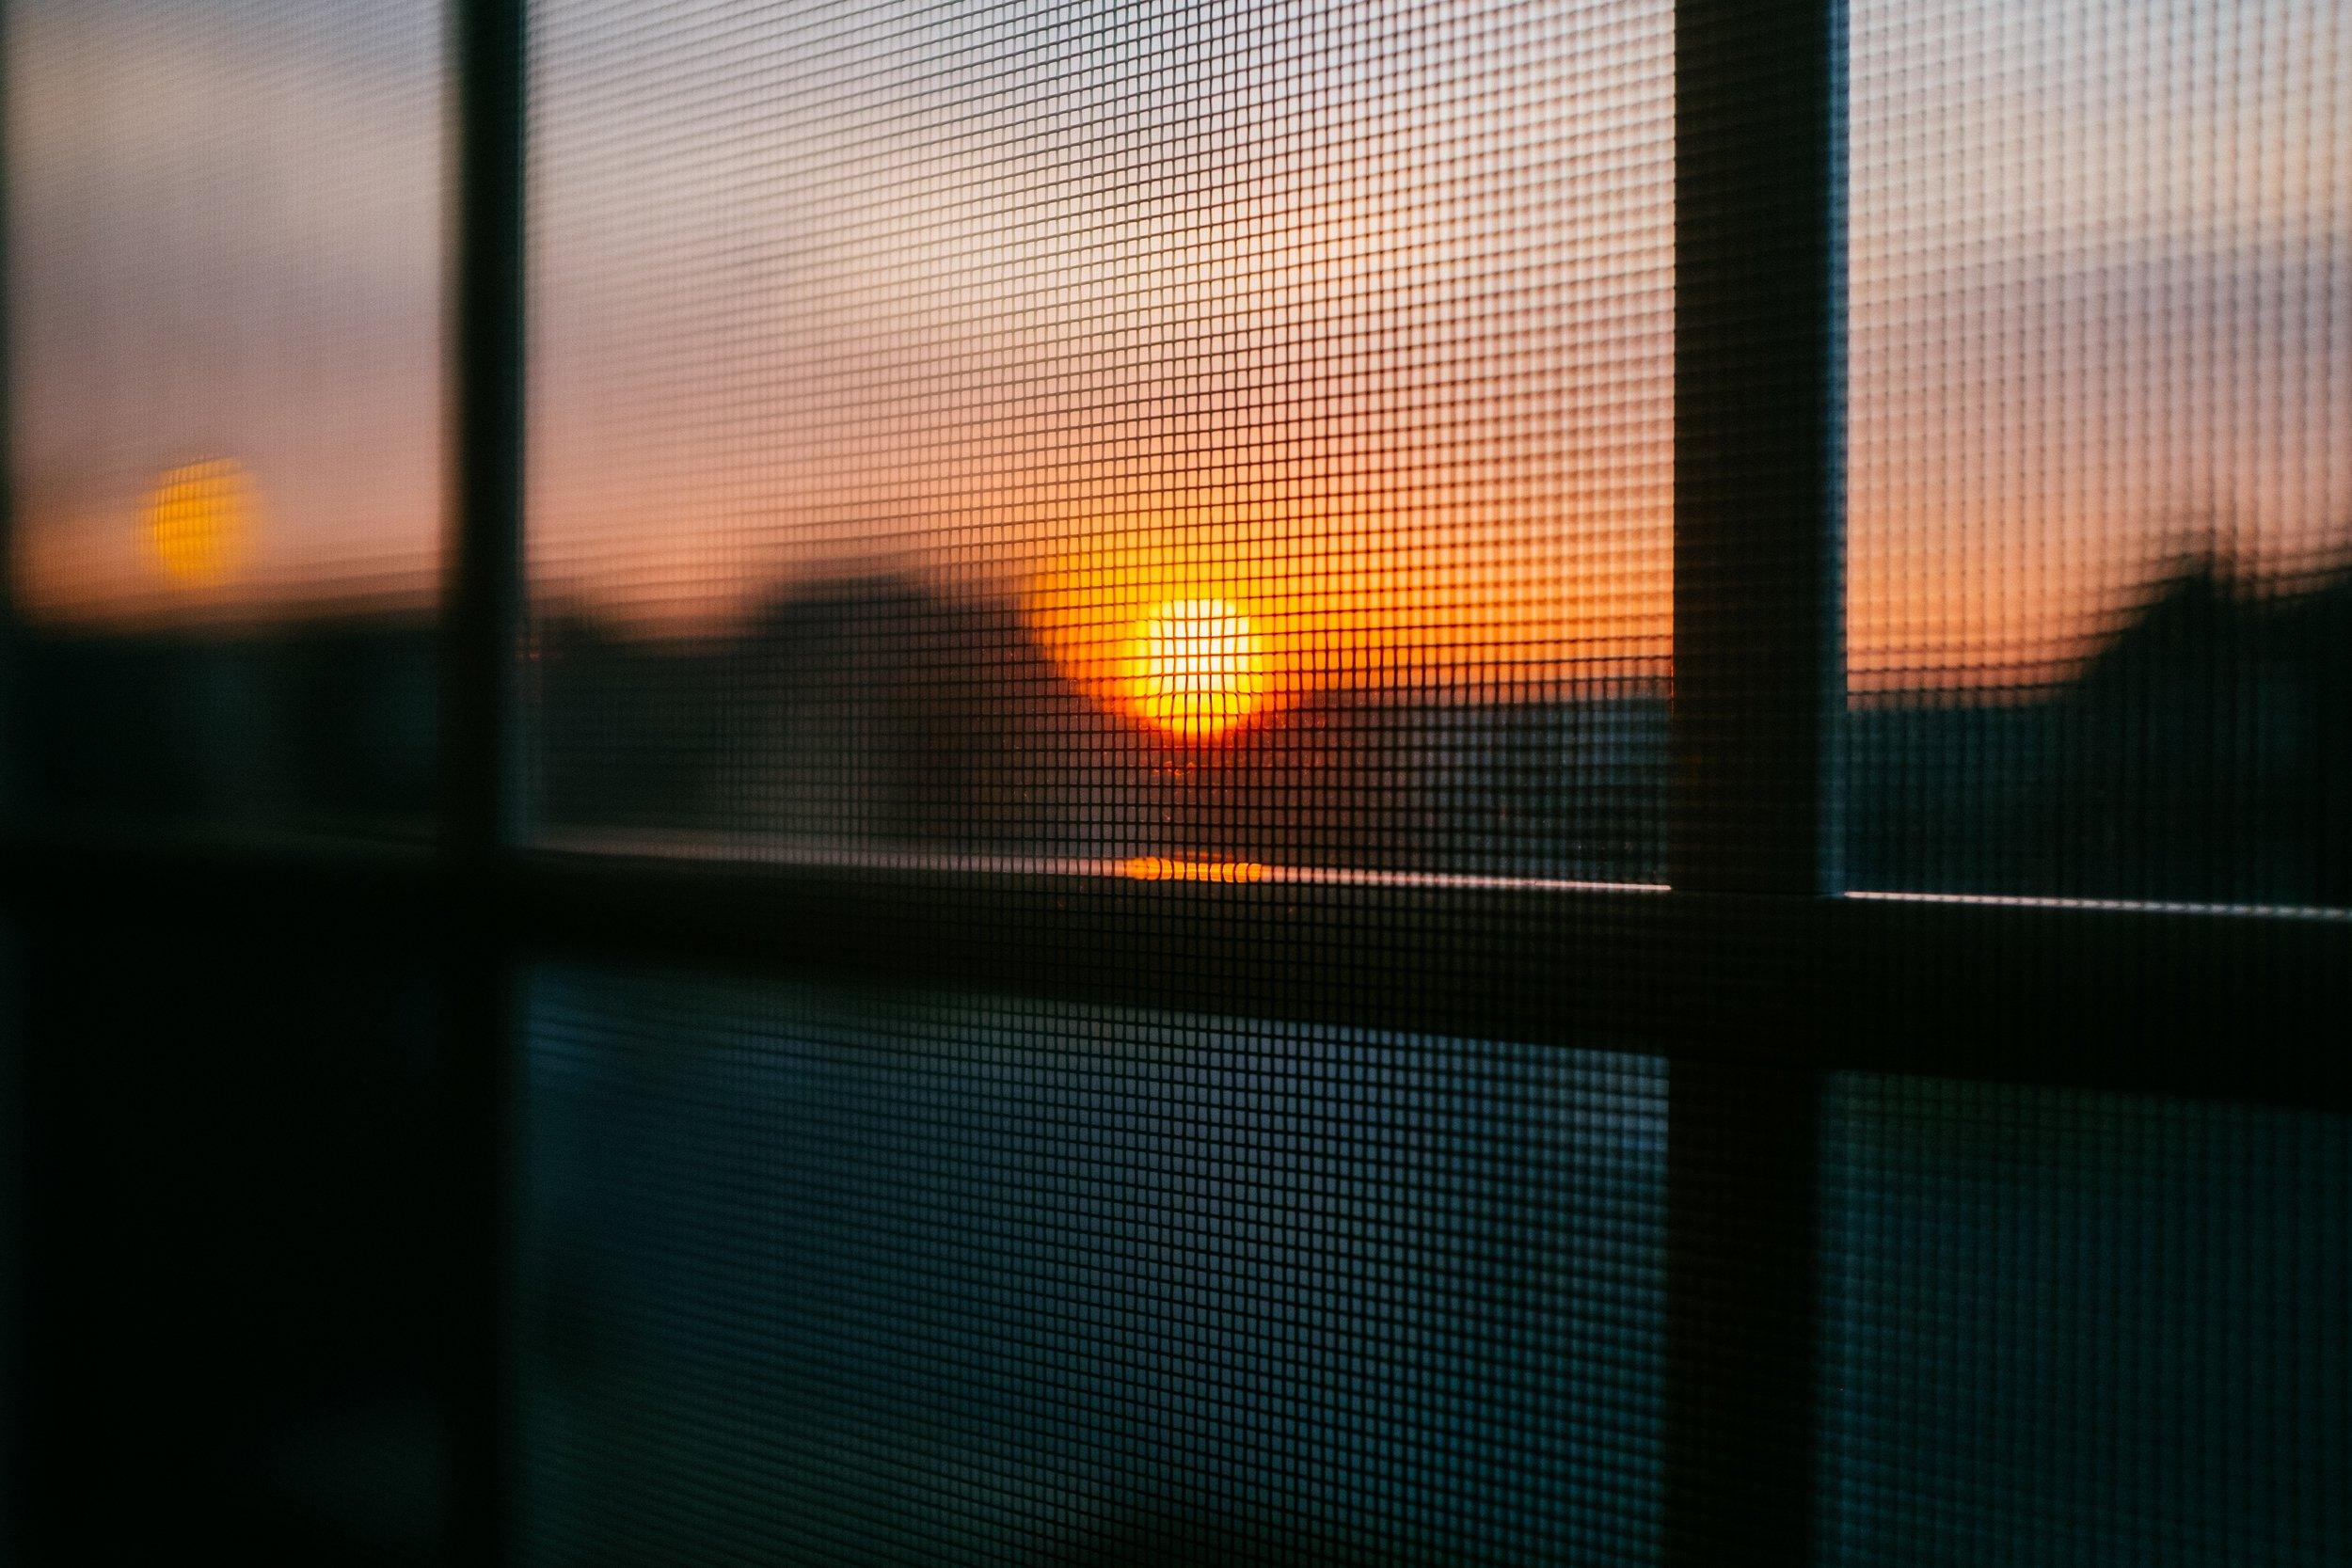 Window Screen: Repairing Window Screens